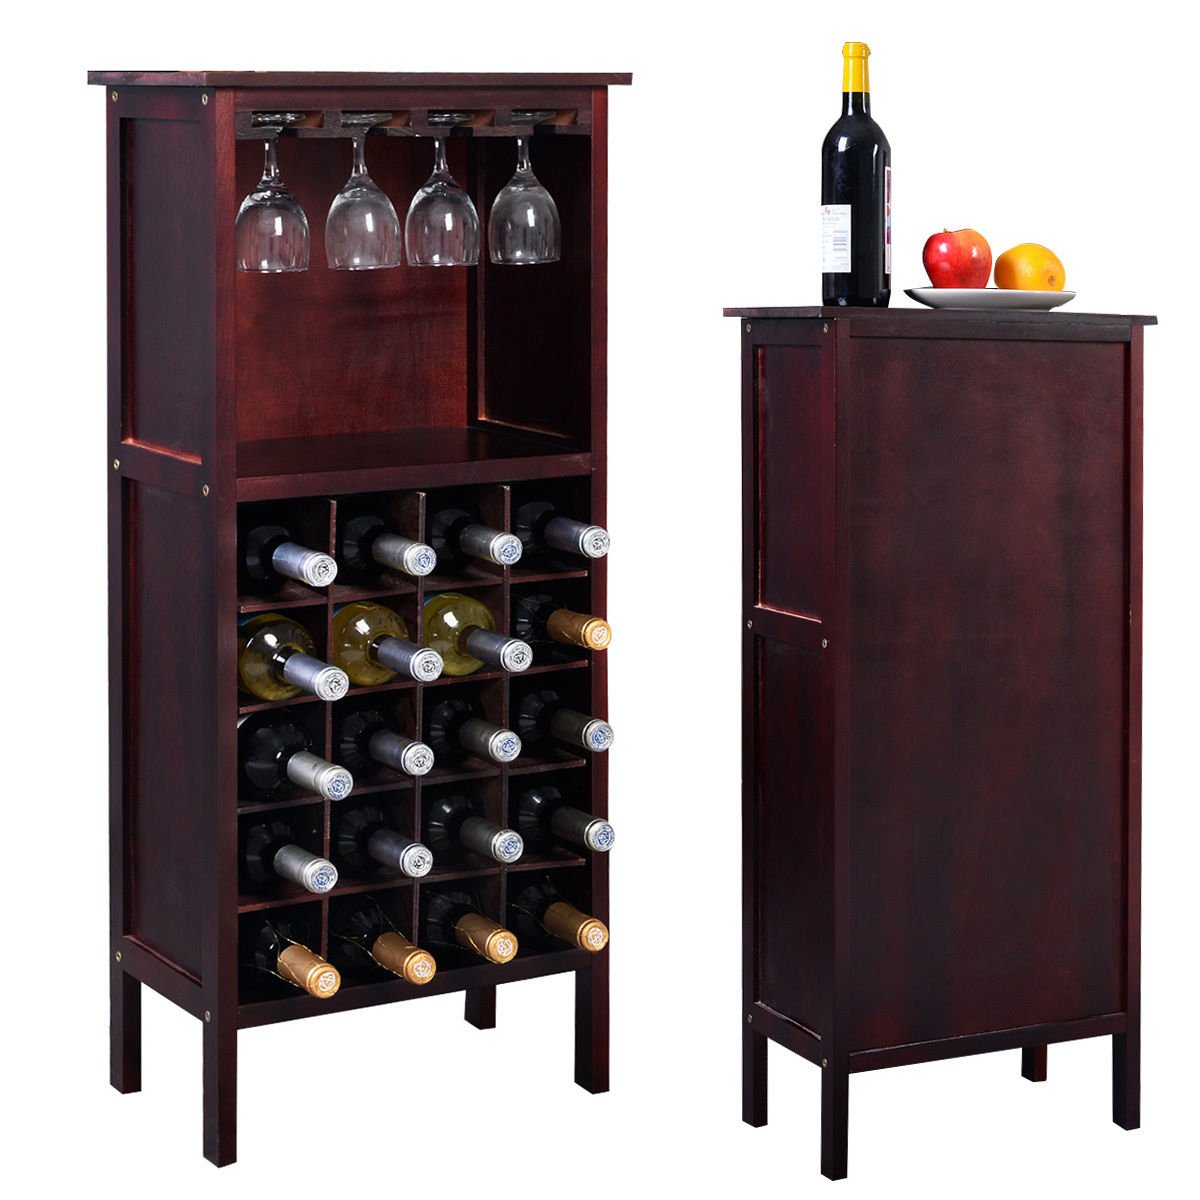 New Wine Wooden Cabinet Bottle Holder Storage Kitchen Home Bar w/ Glass Rack by Unknown (Image #1)